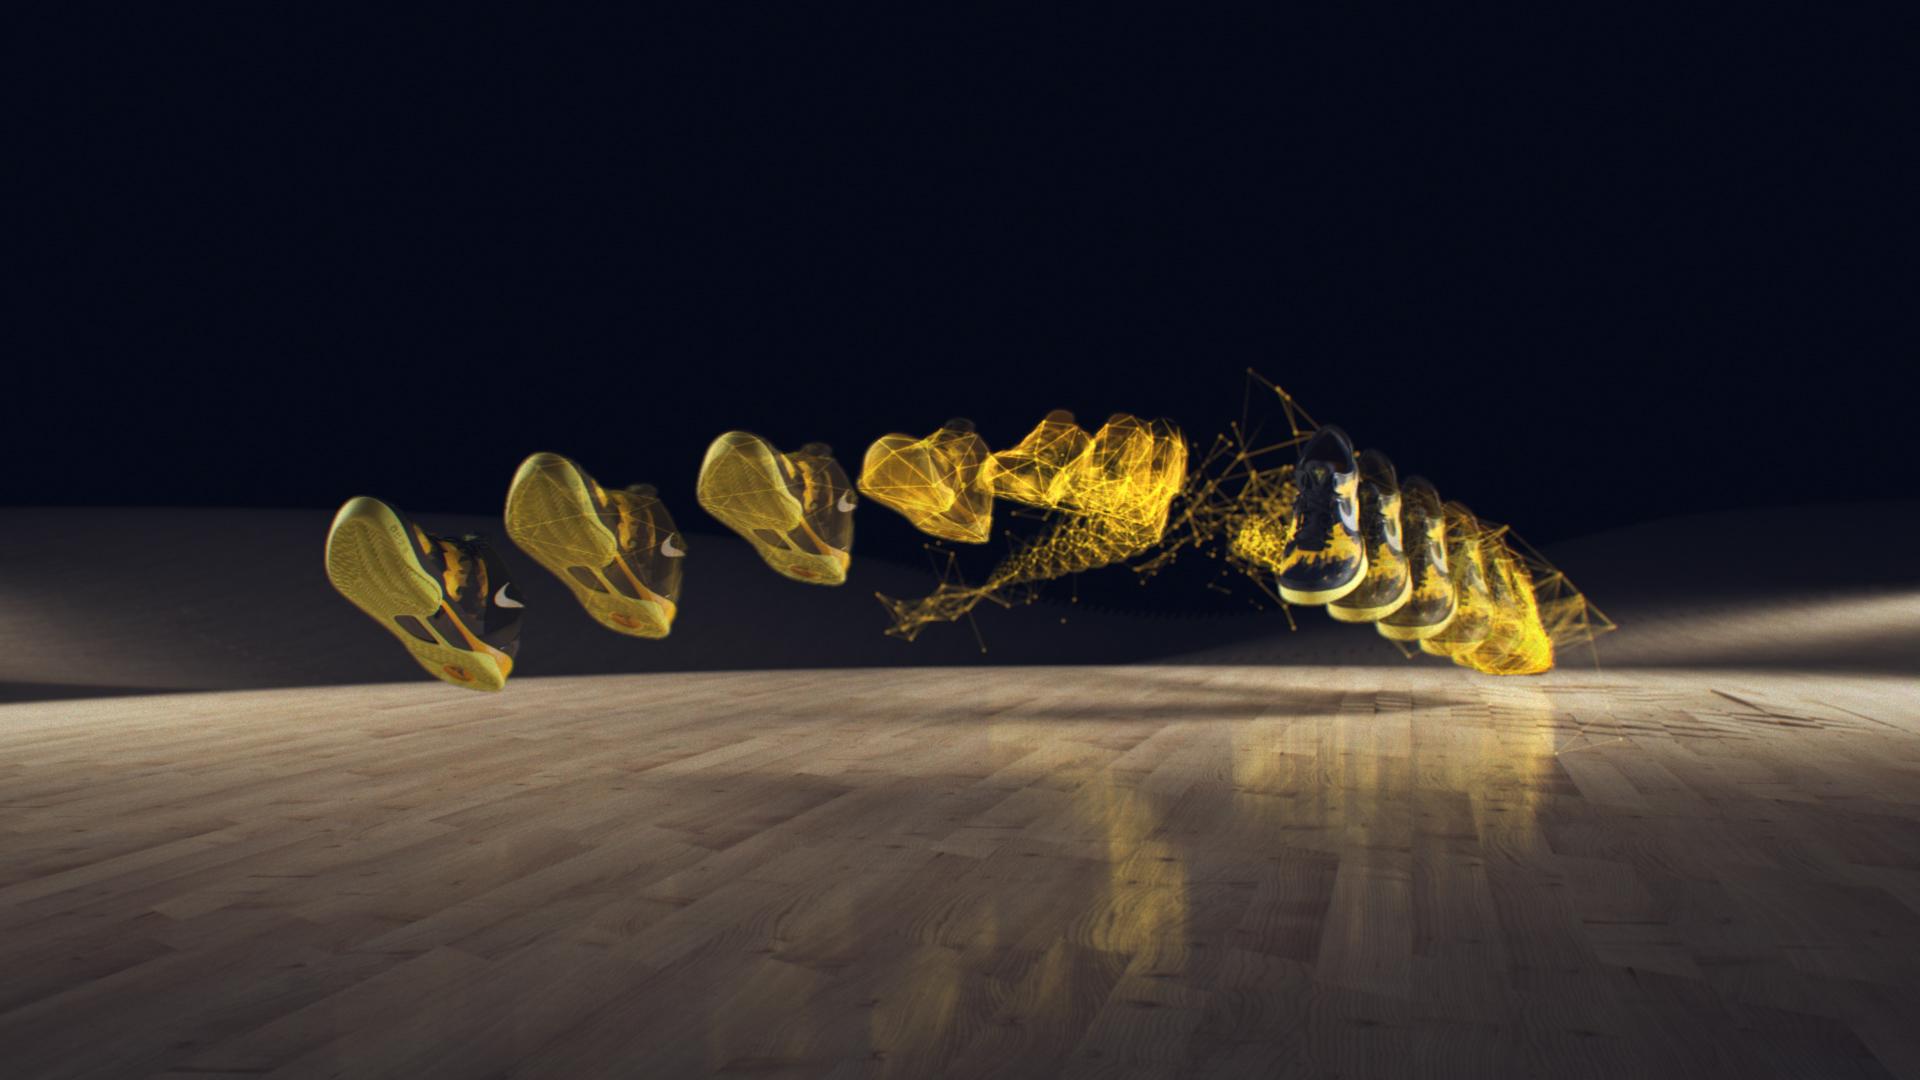 Nike_Kobe8_Directors_Cut_19_12_12 (00432).jpg